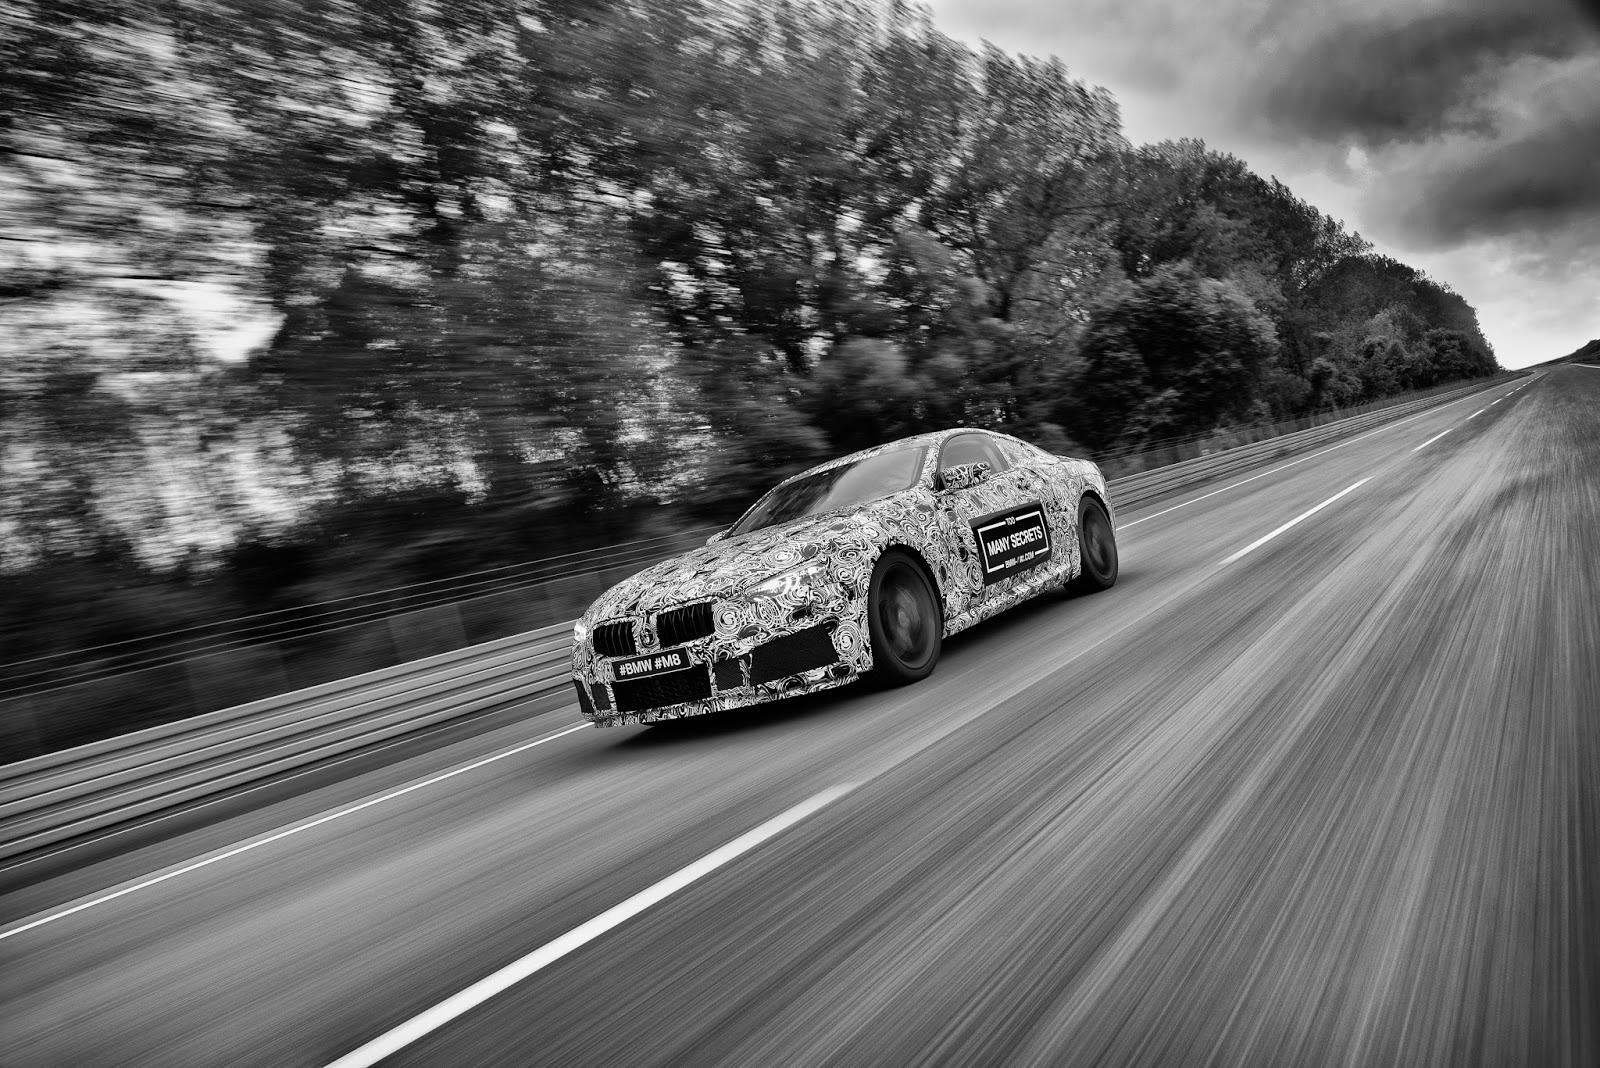 P90260940 highRes bmw m8 prototype 05 1 1 H ναυαρχίδα της BMW, η M8 θα είναι οκτακύλινδρη BMW, BMW Concept, BMW Concept 8 Series, BMW M, BMW M Performance, BMW M8